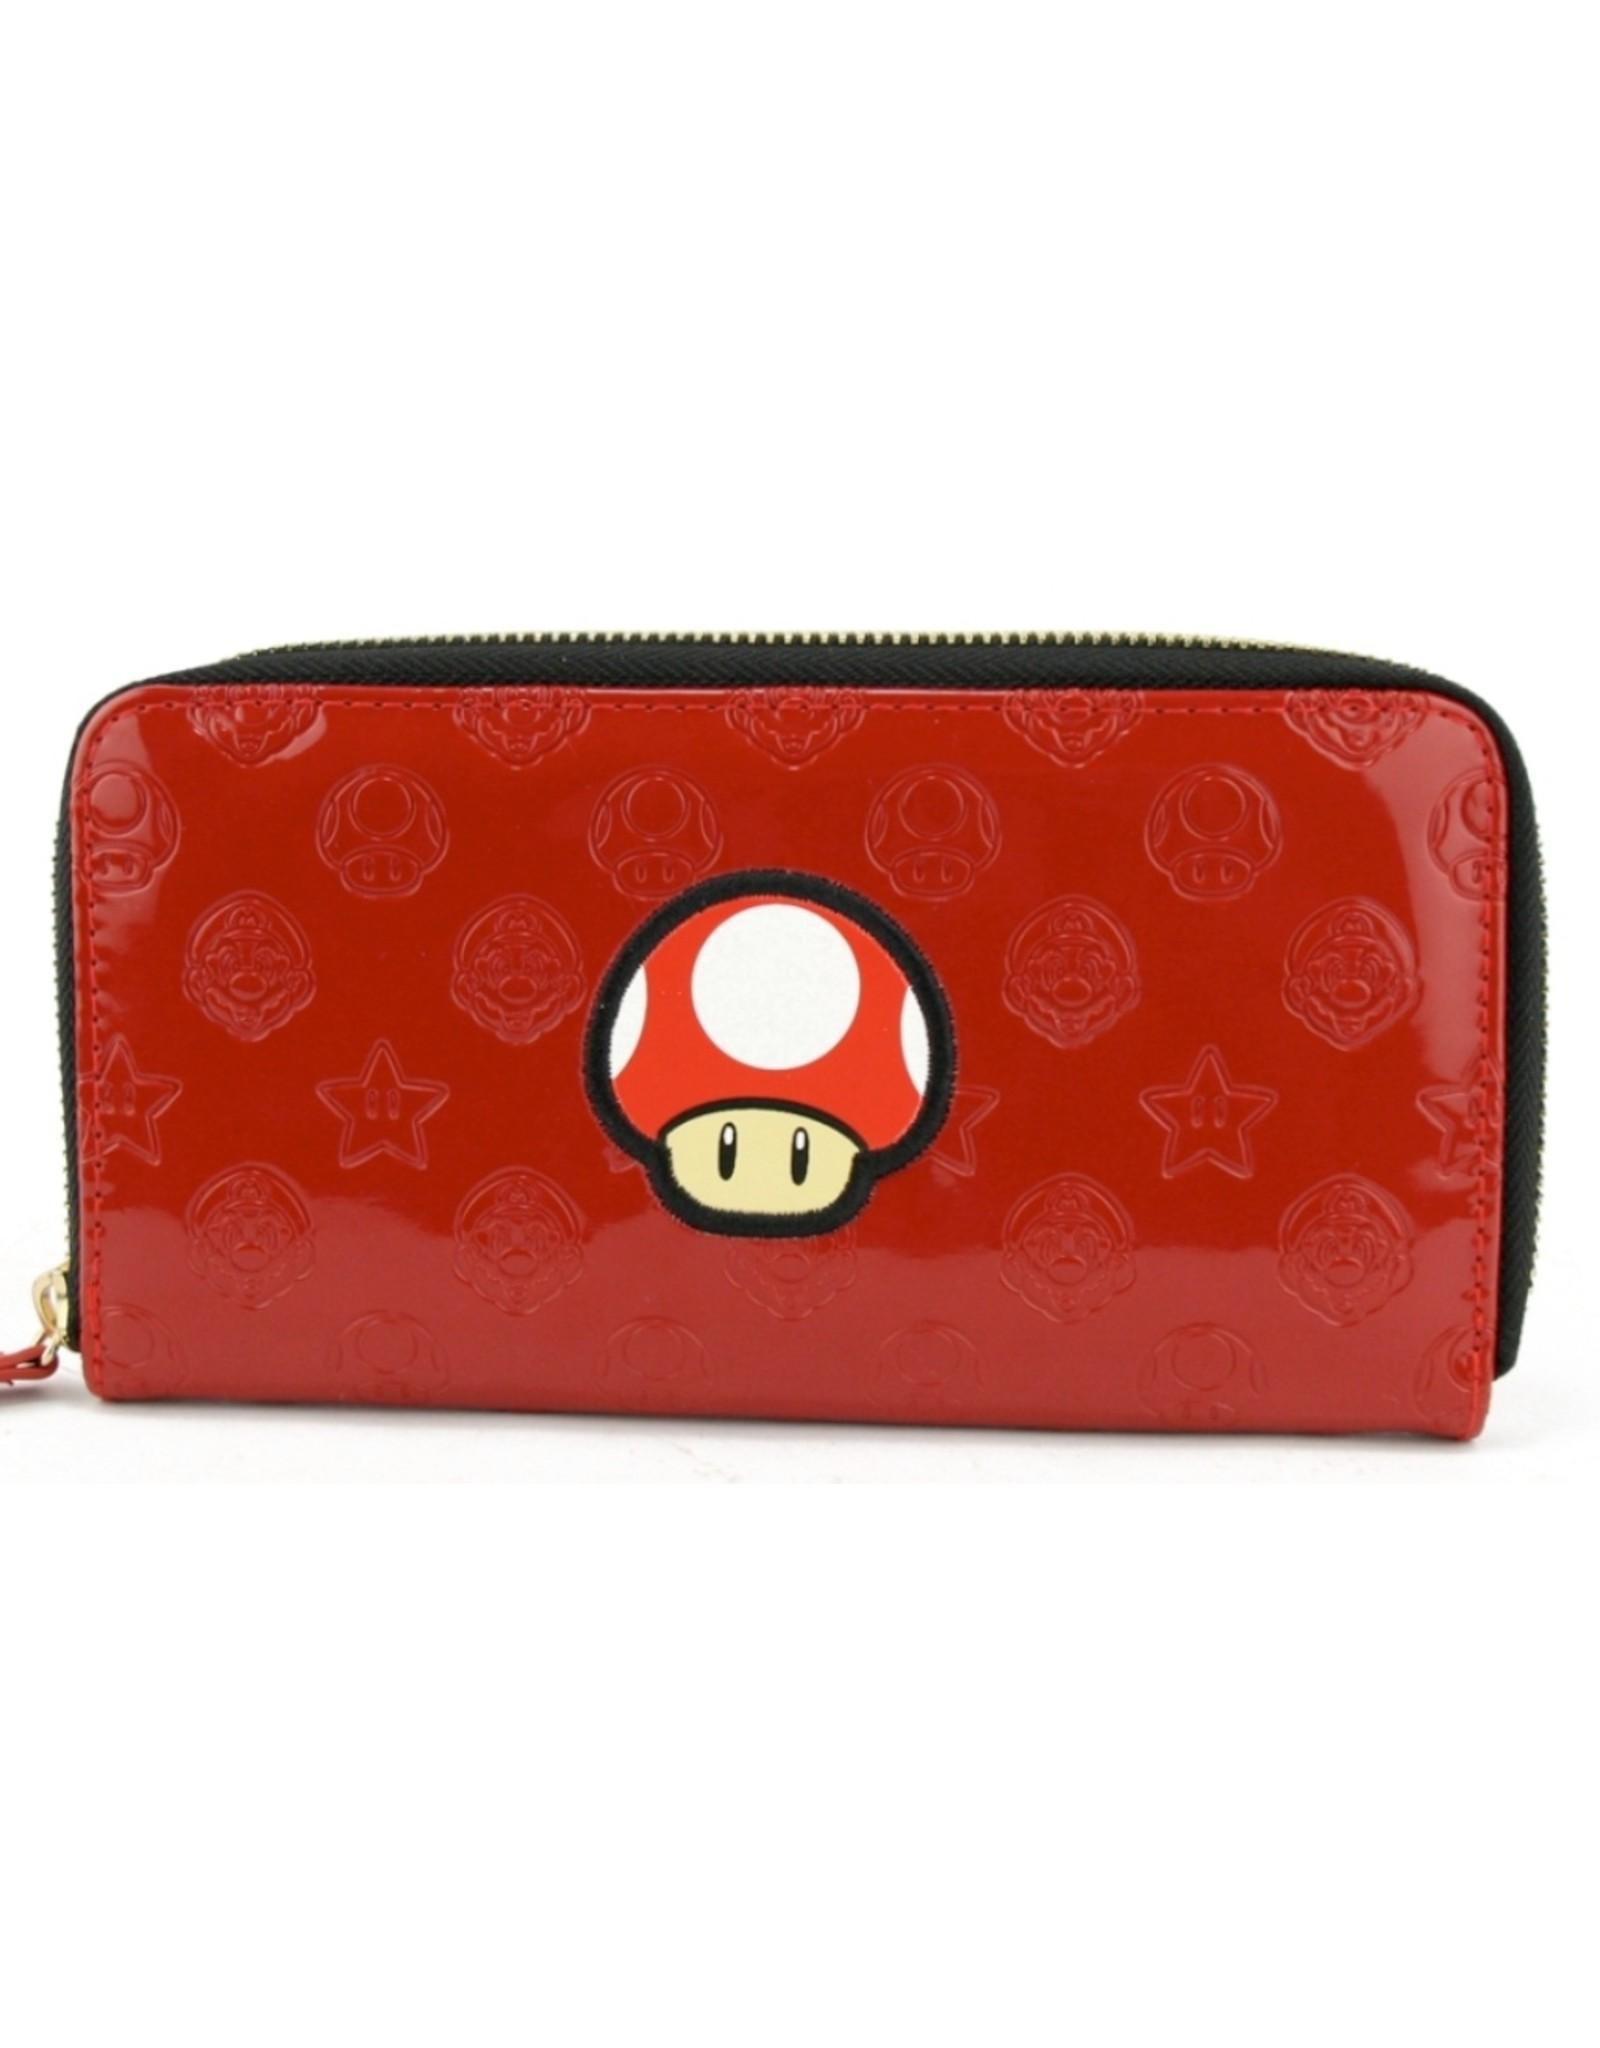 Nintendo Merchandise portemonnees - Nintendo Super Mario Mushroom portemonnee